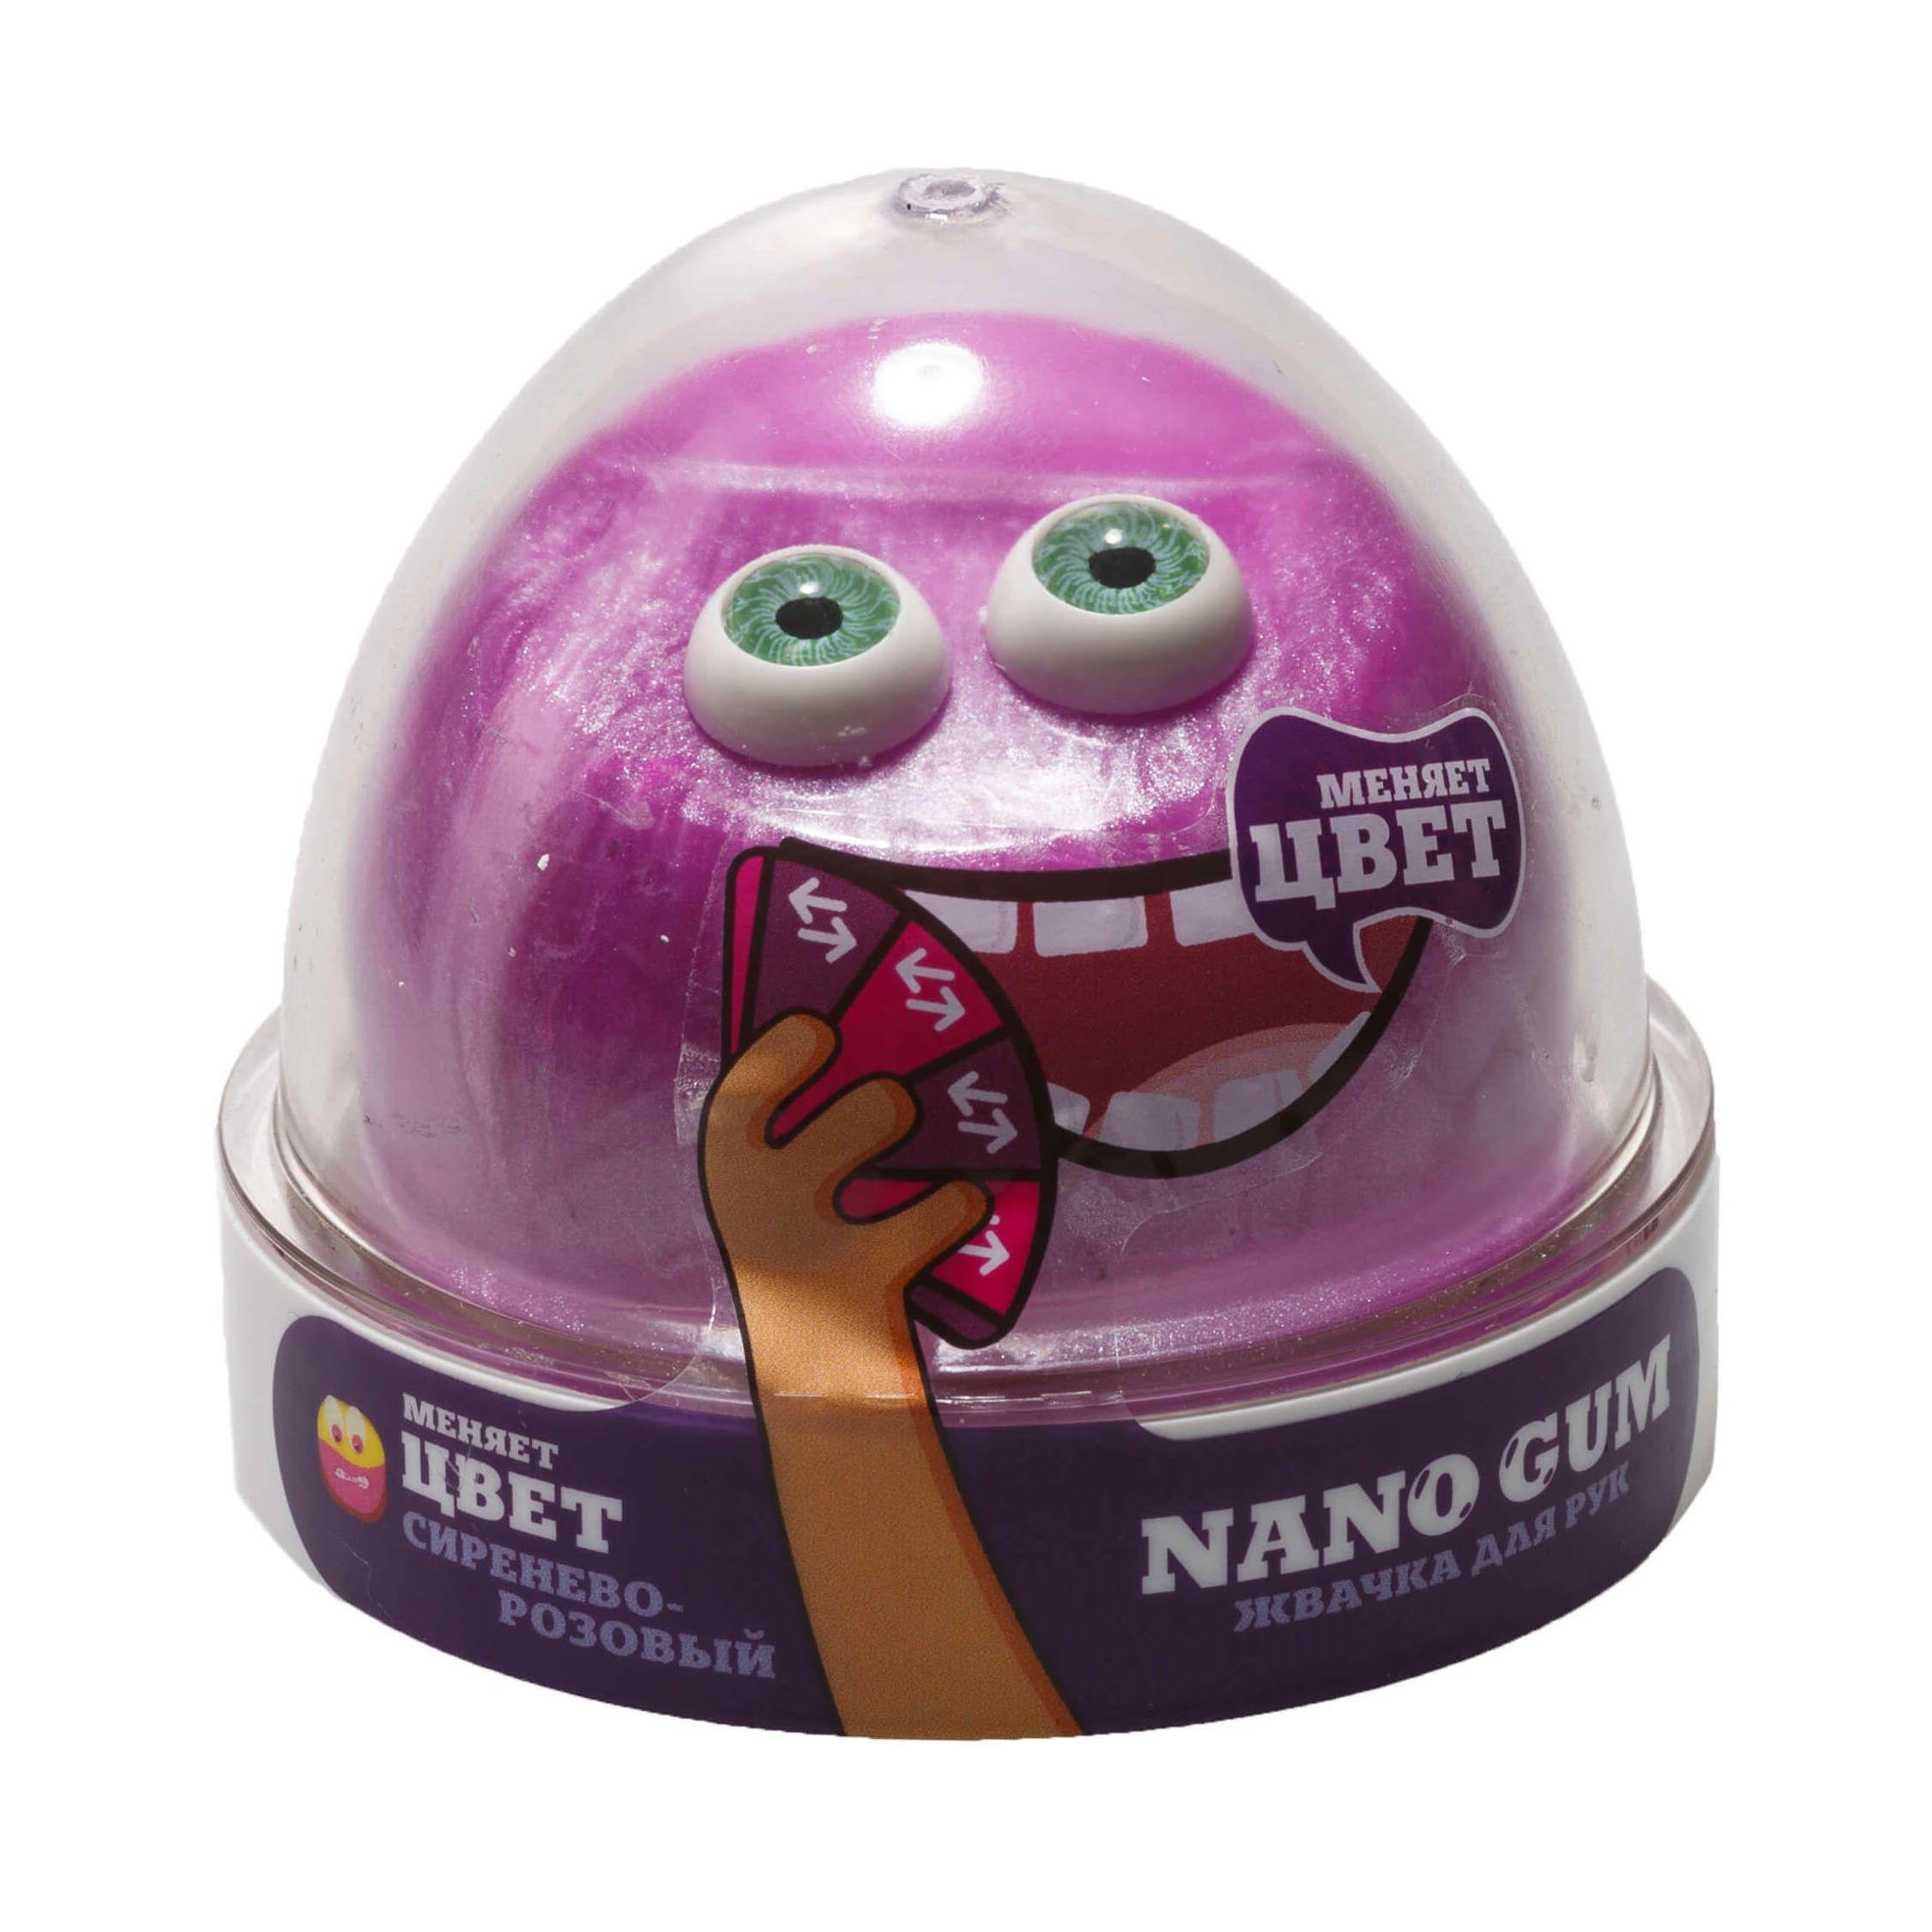 Жвачка для рук Nano Gum, сиренево-розовая, меняет цвет, 50 гр.